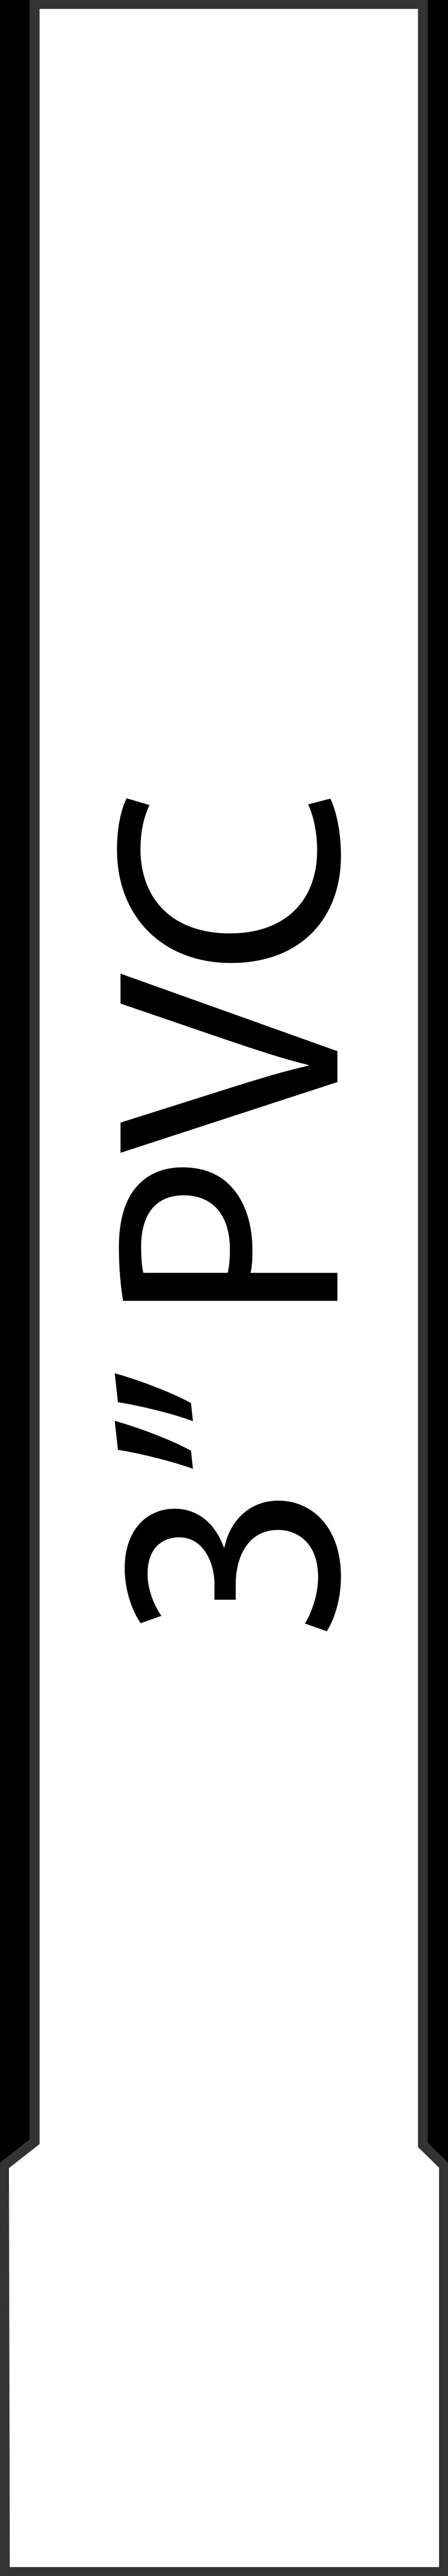 Short 3' PVC Pipe